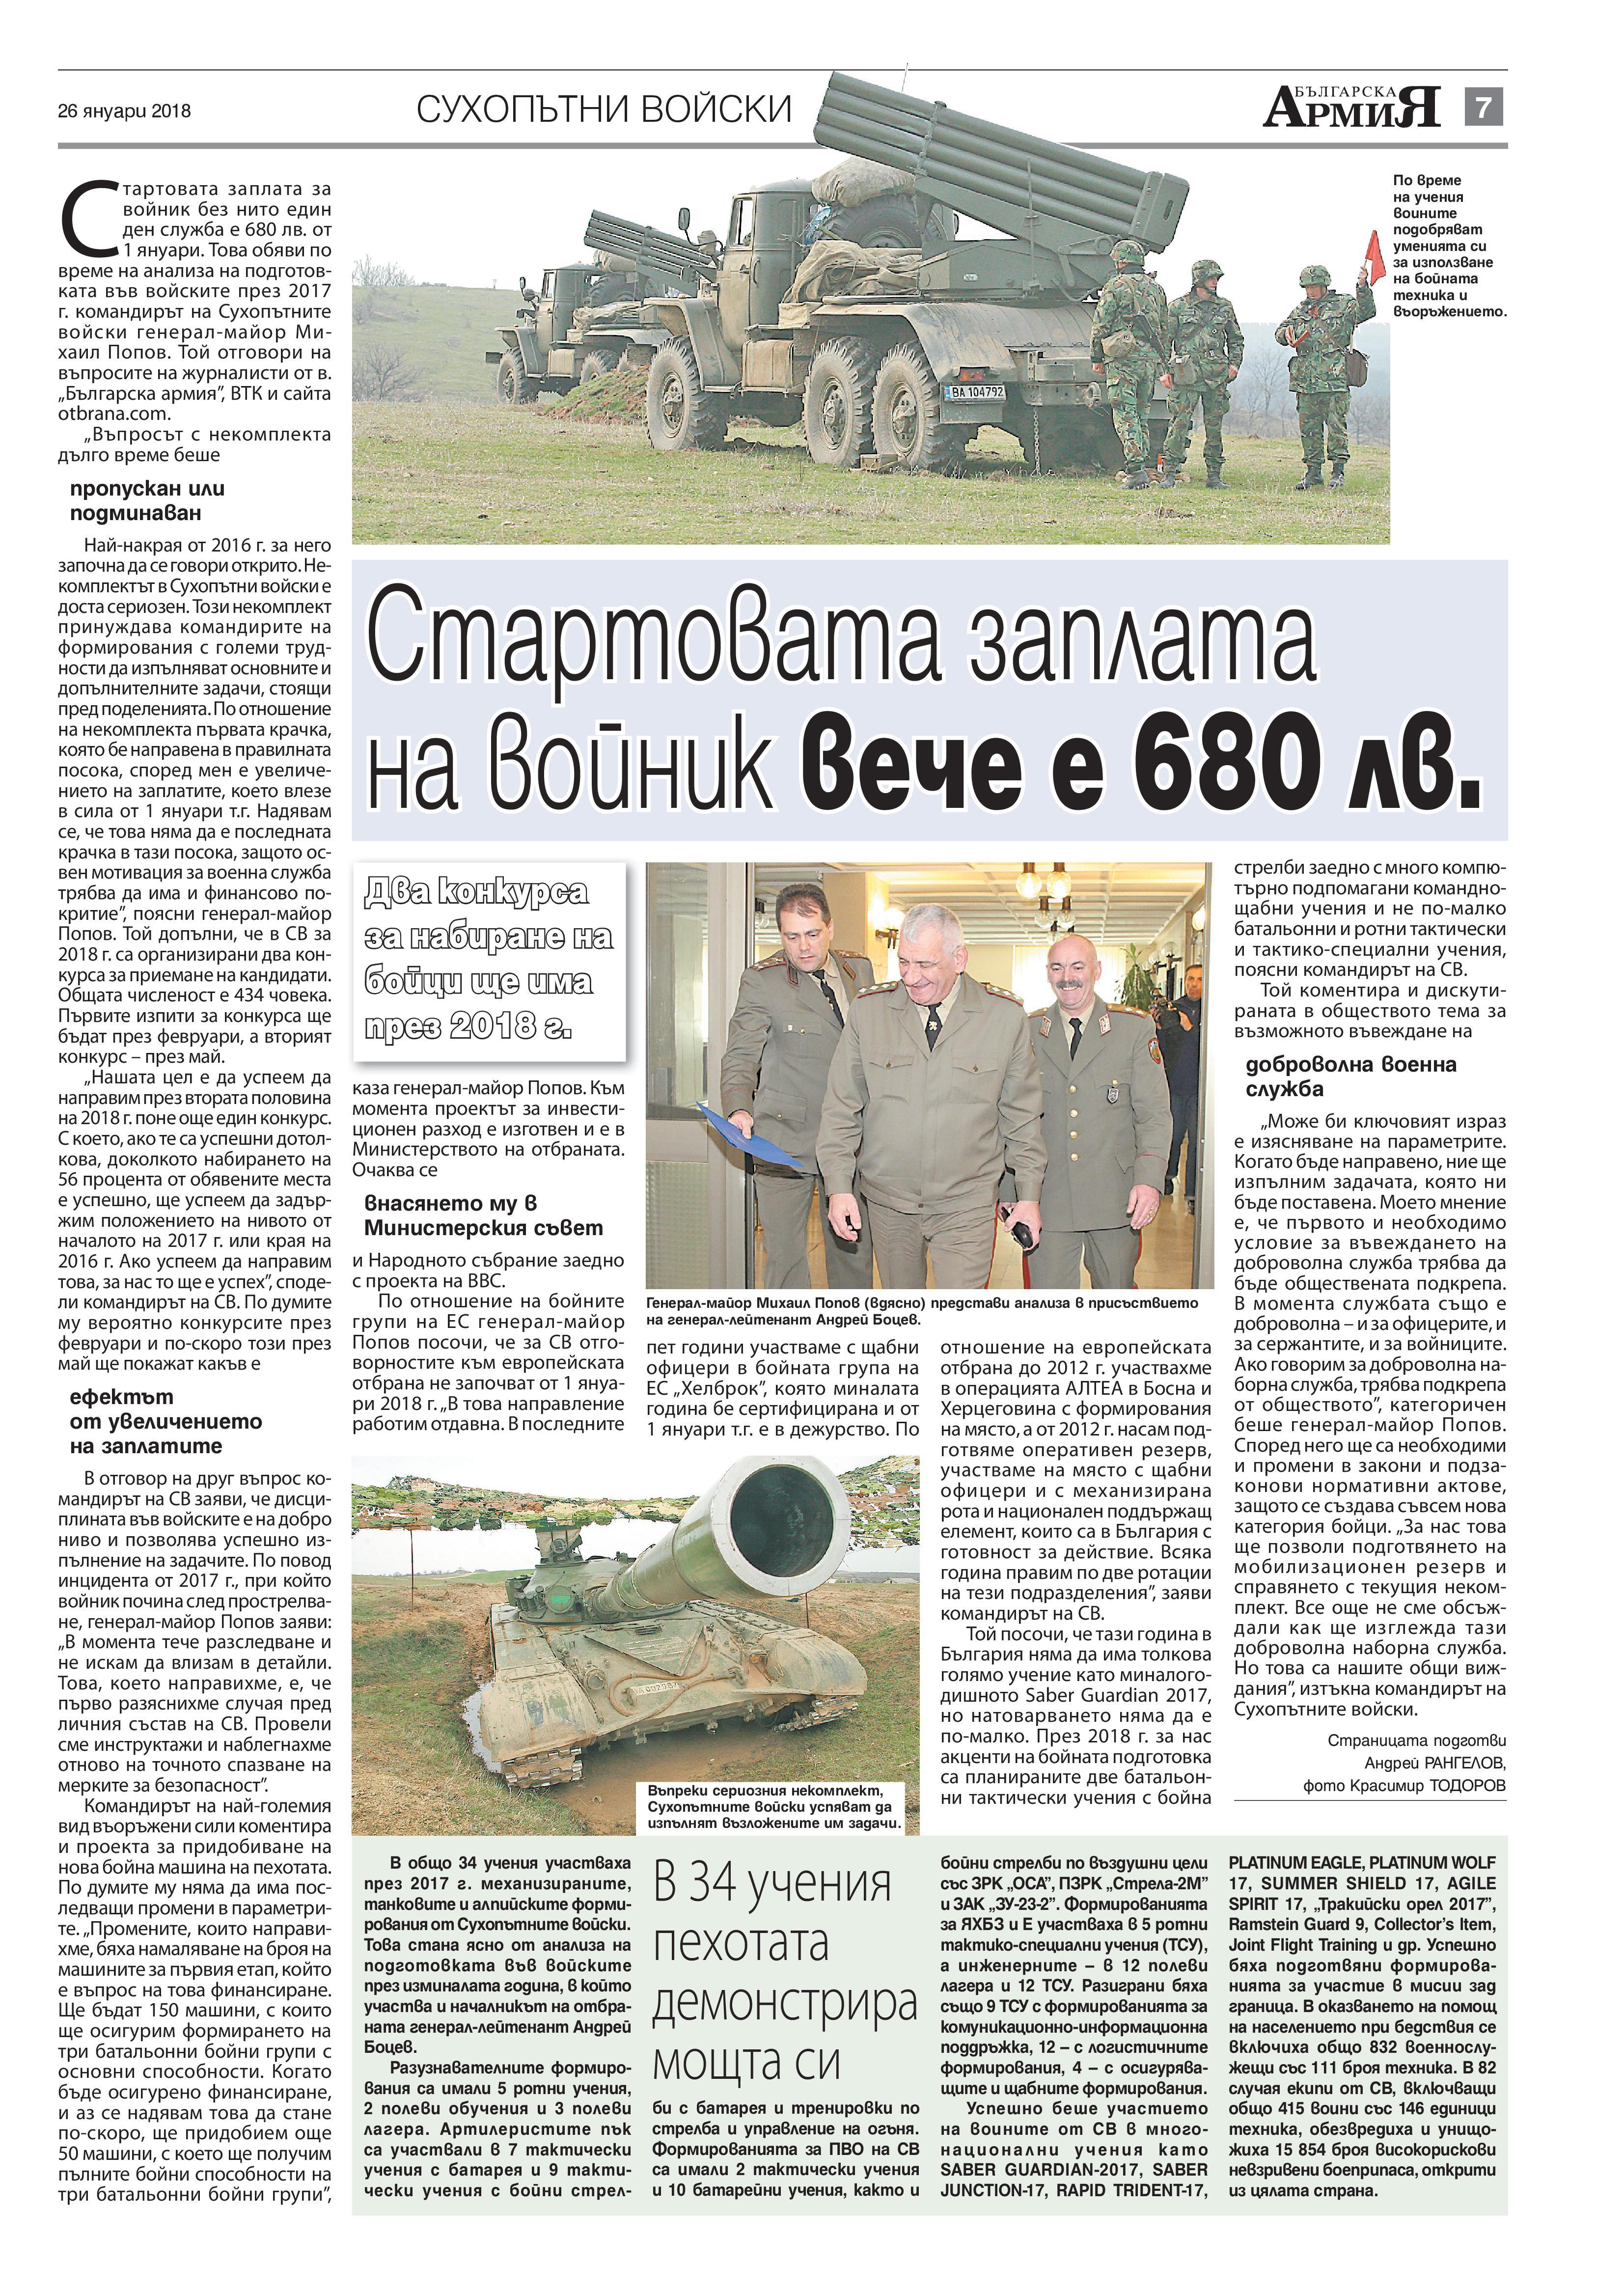 http://armymedia.bg/wp-content/uploads/2015/06/07-17.jpg